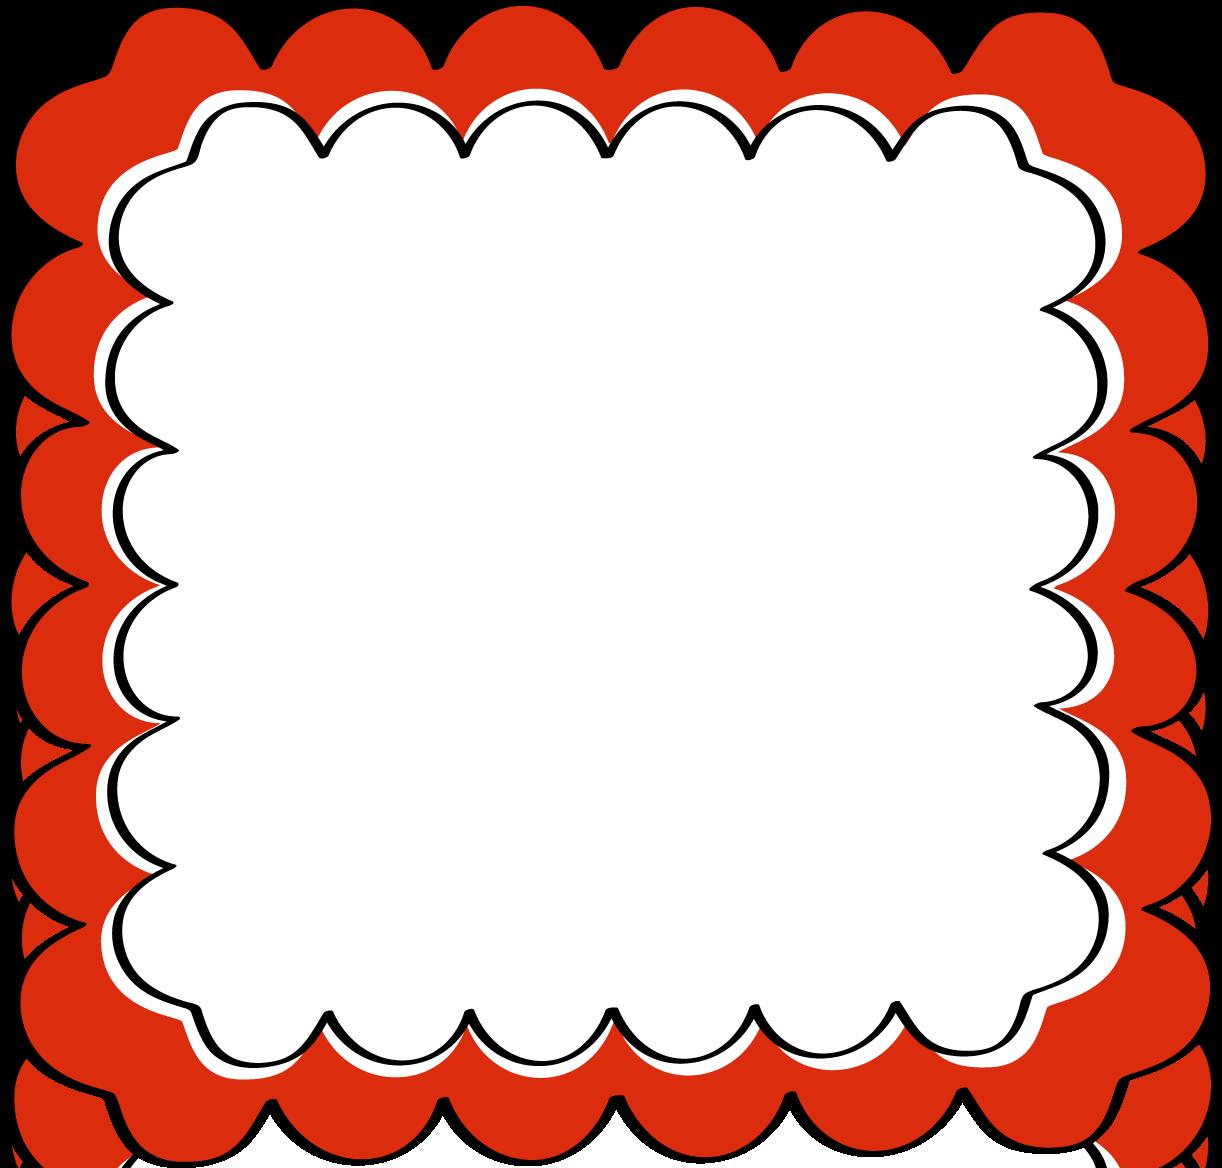 Scalloped Border Clipart.